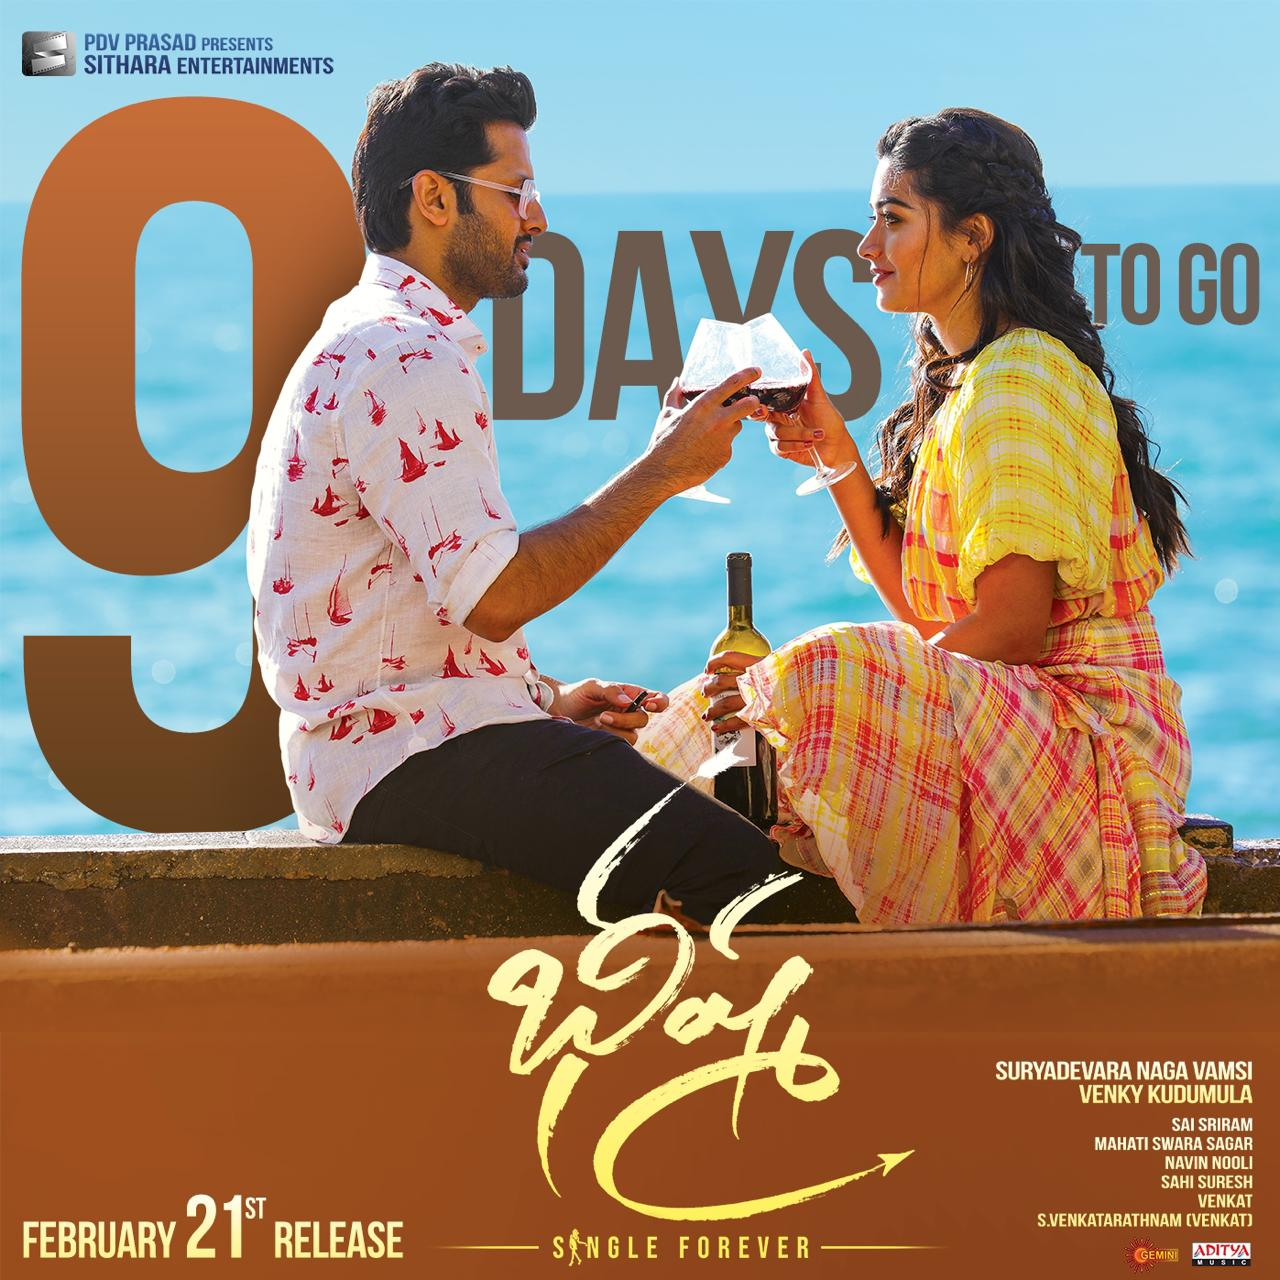 Bheeshma Movie Release In February